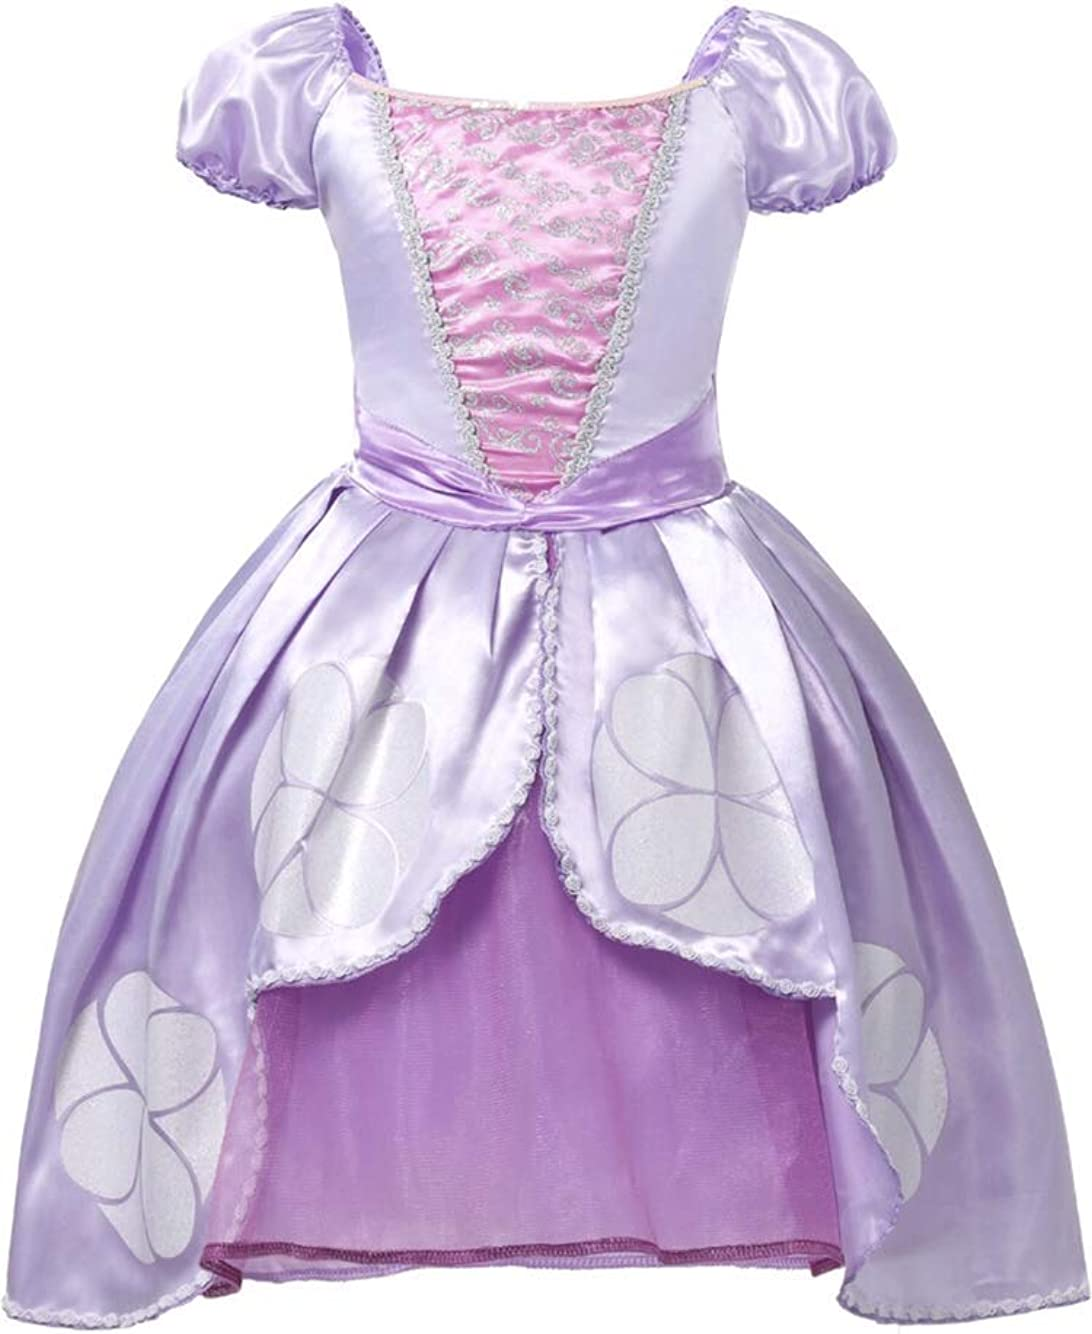 FashionModa4U New Sofia Girls Costume Dress.